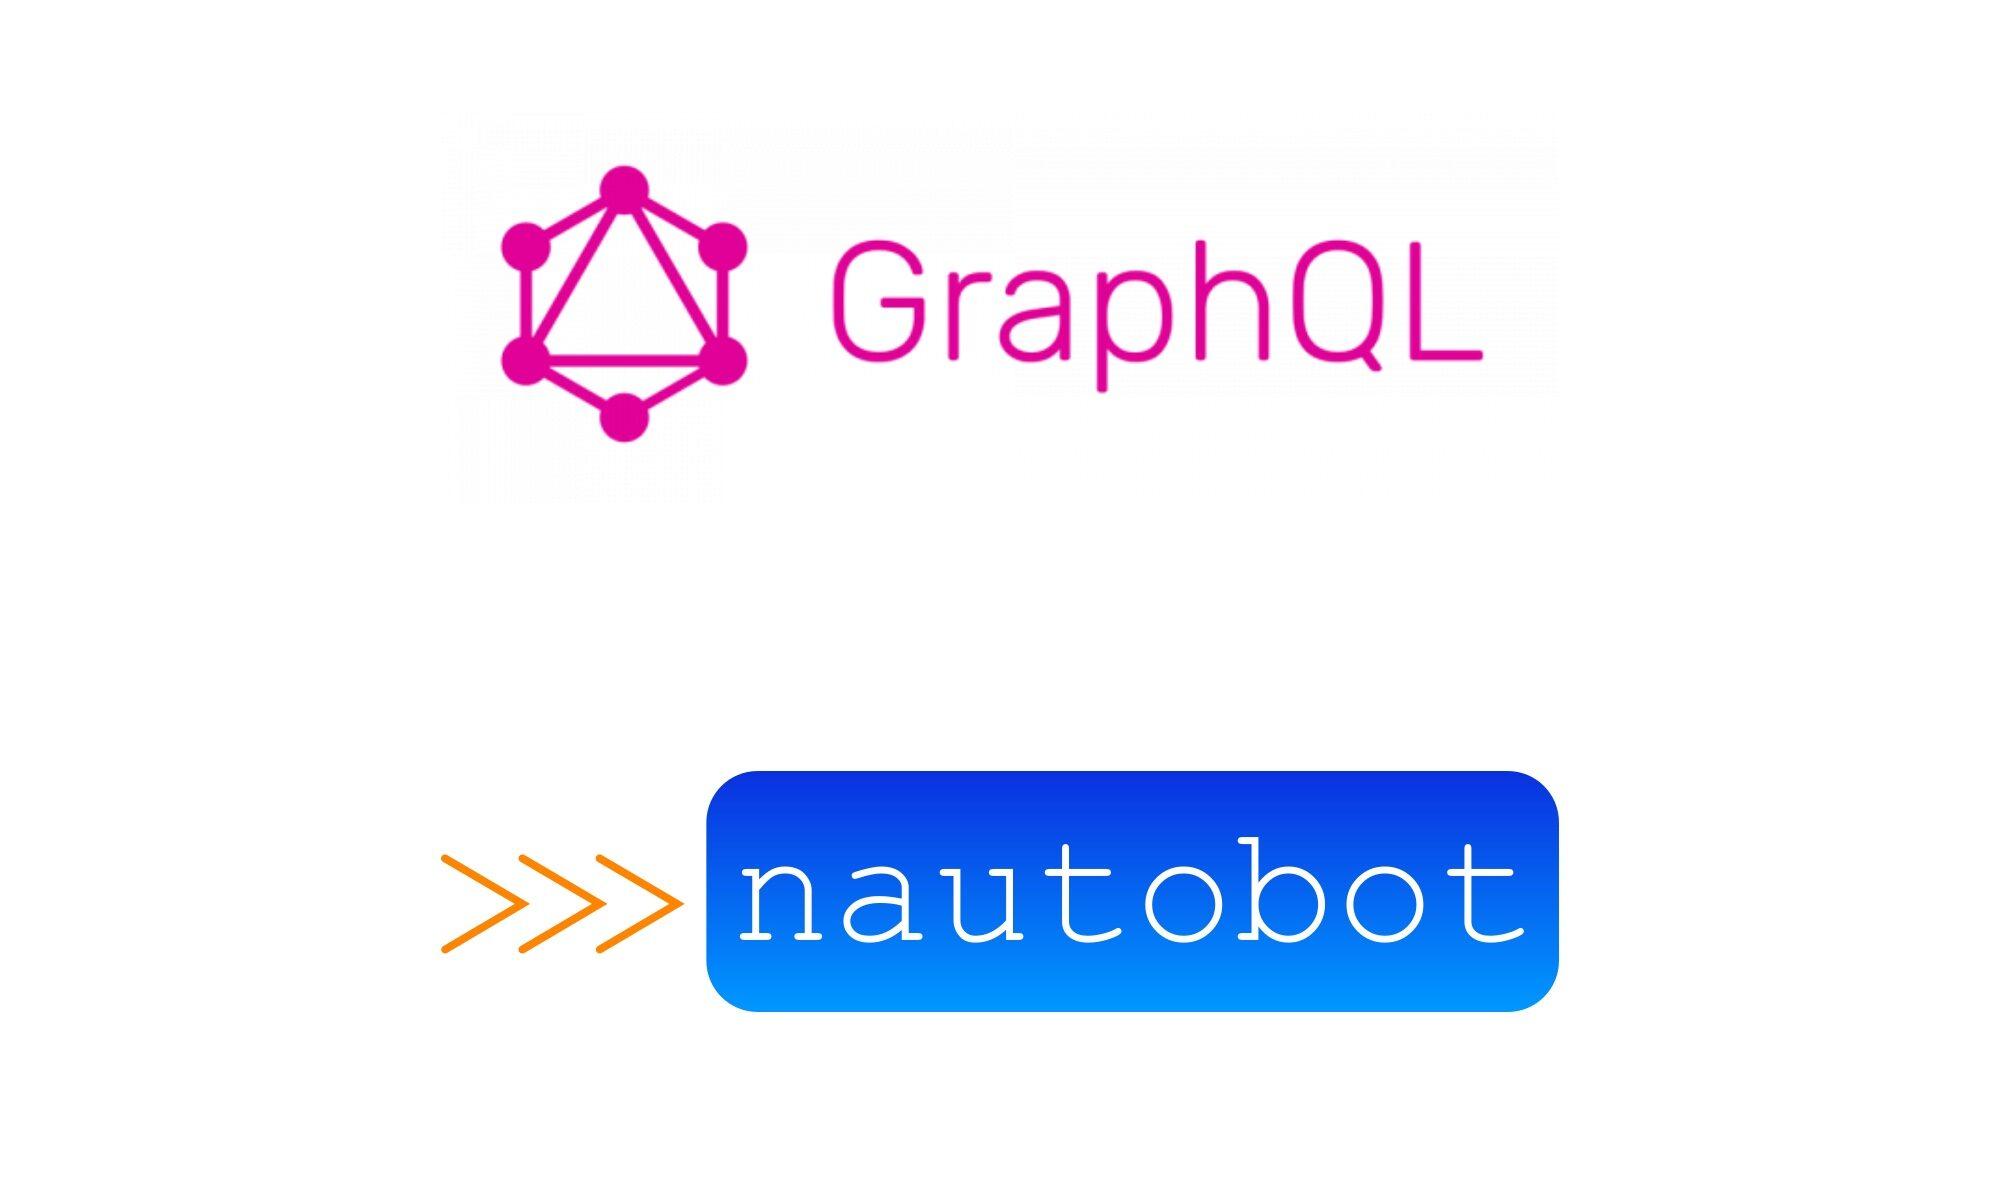 GraphQL Nautobot